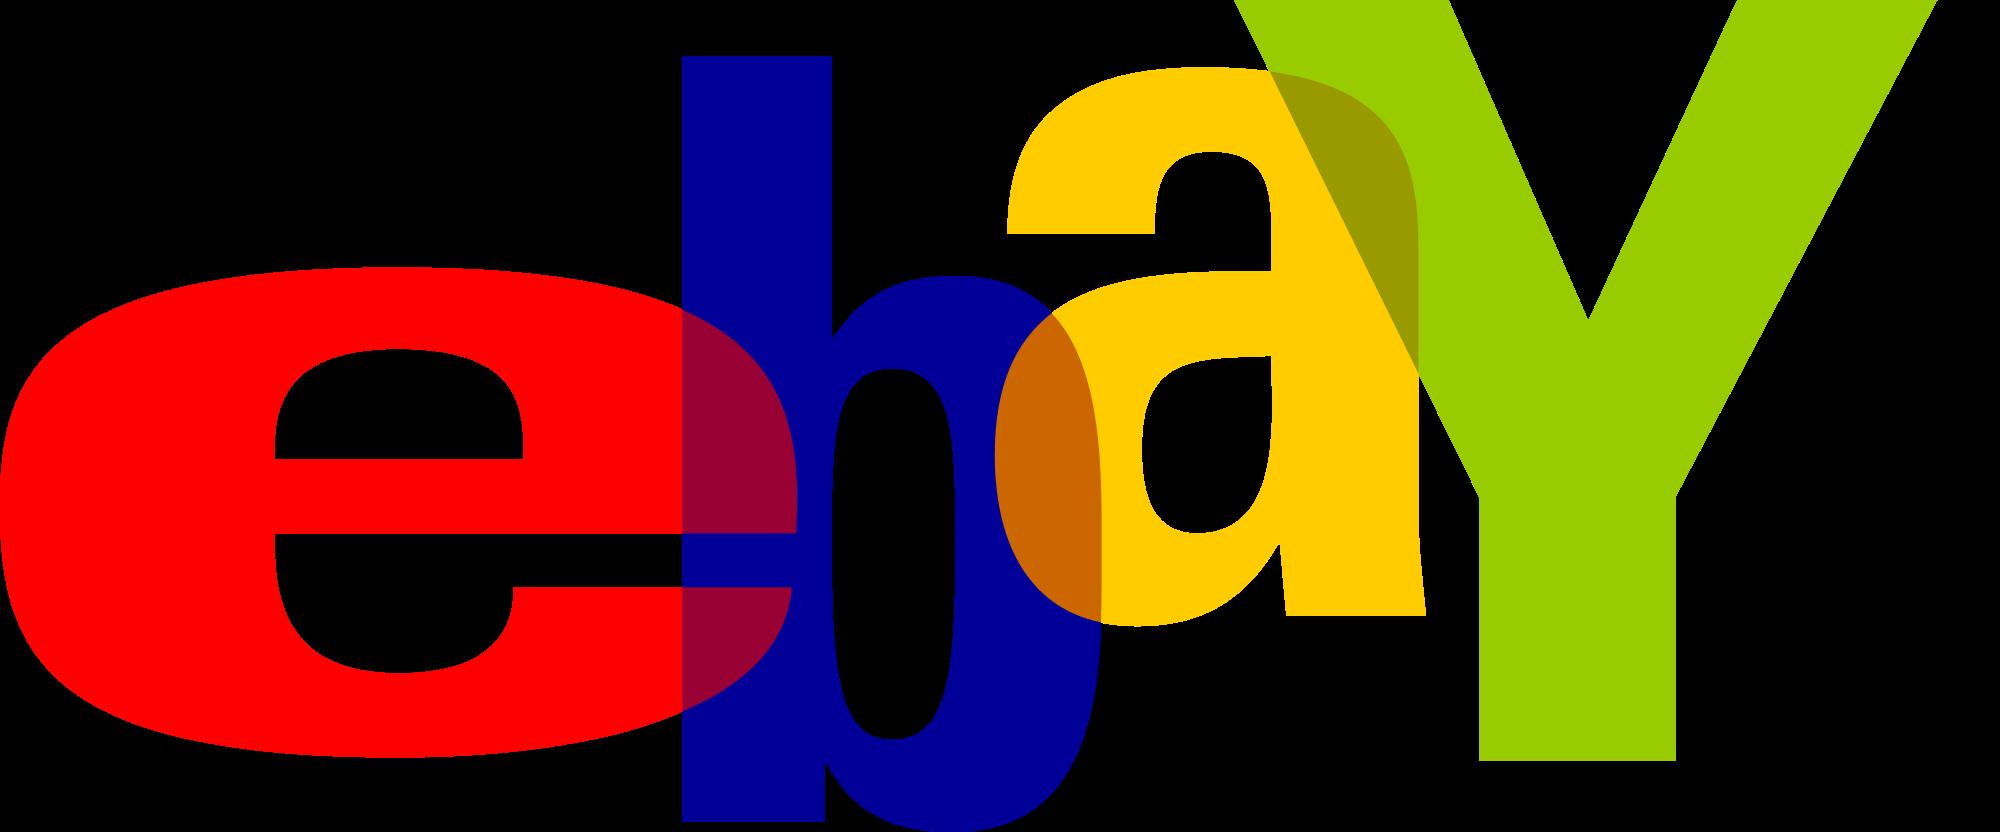 ebay lays off